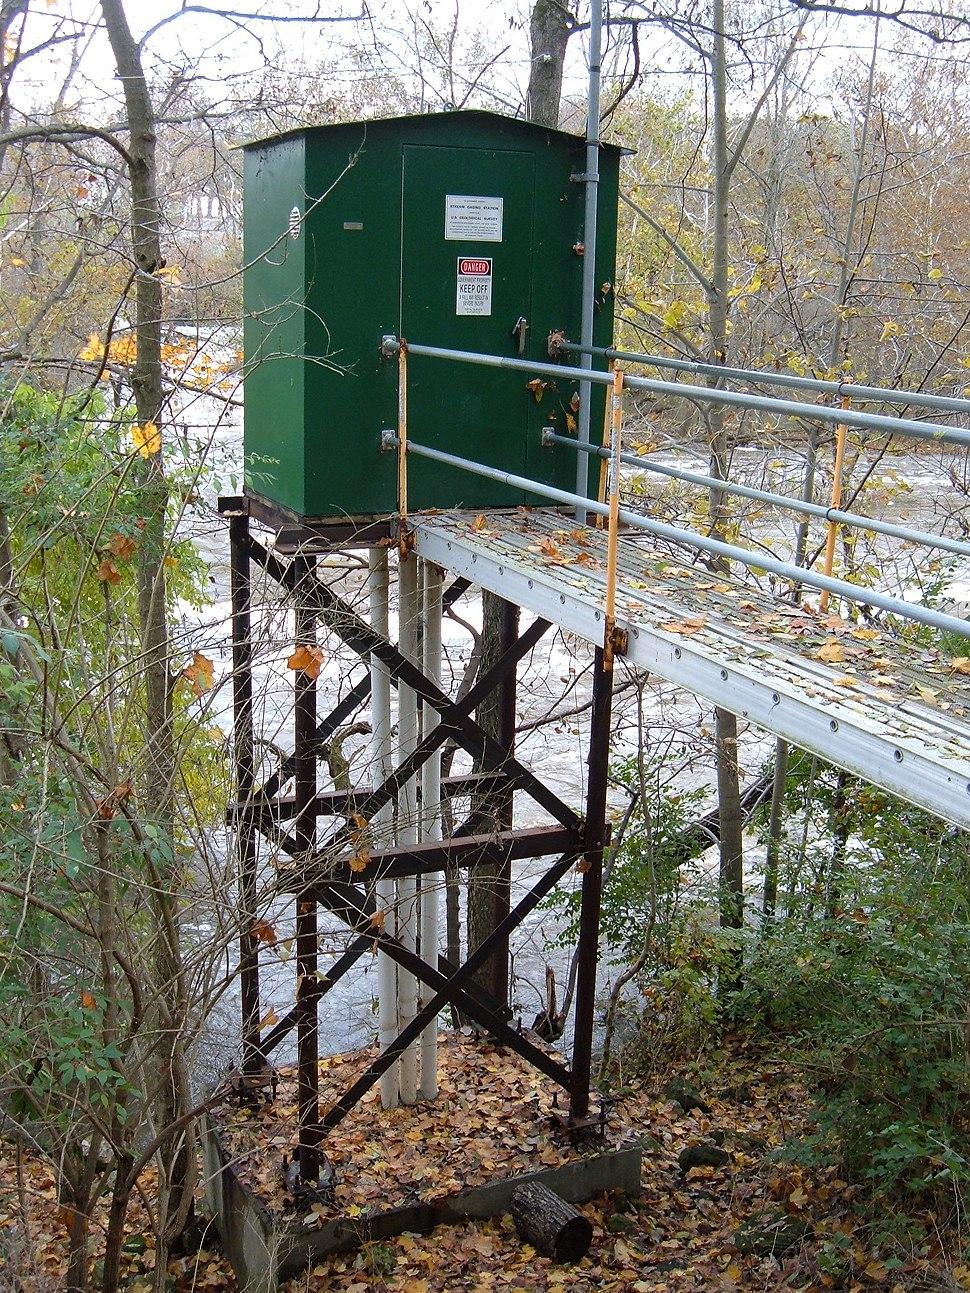 USGS Station